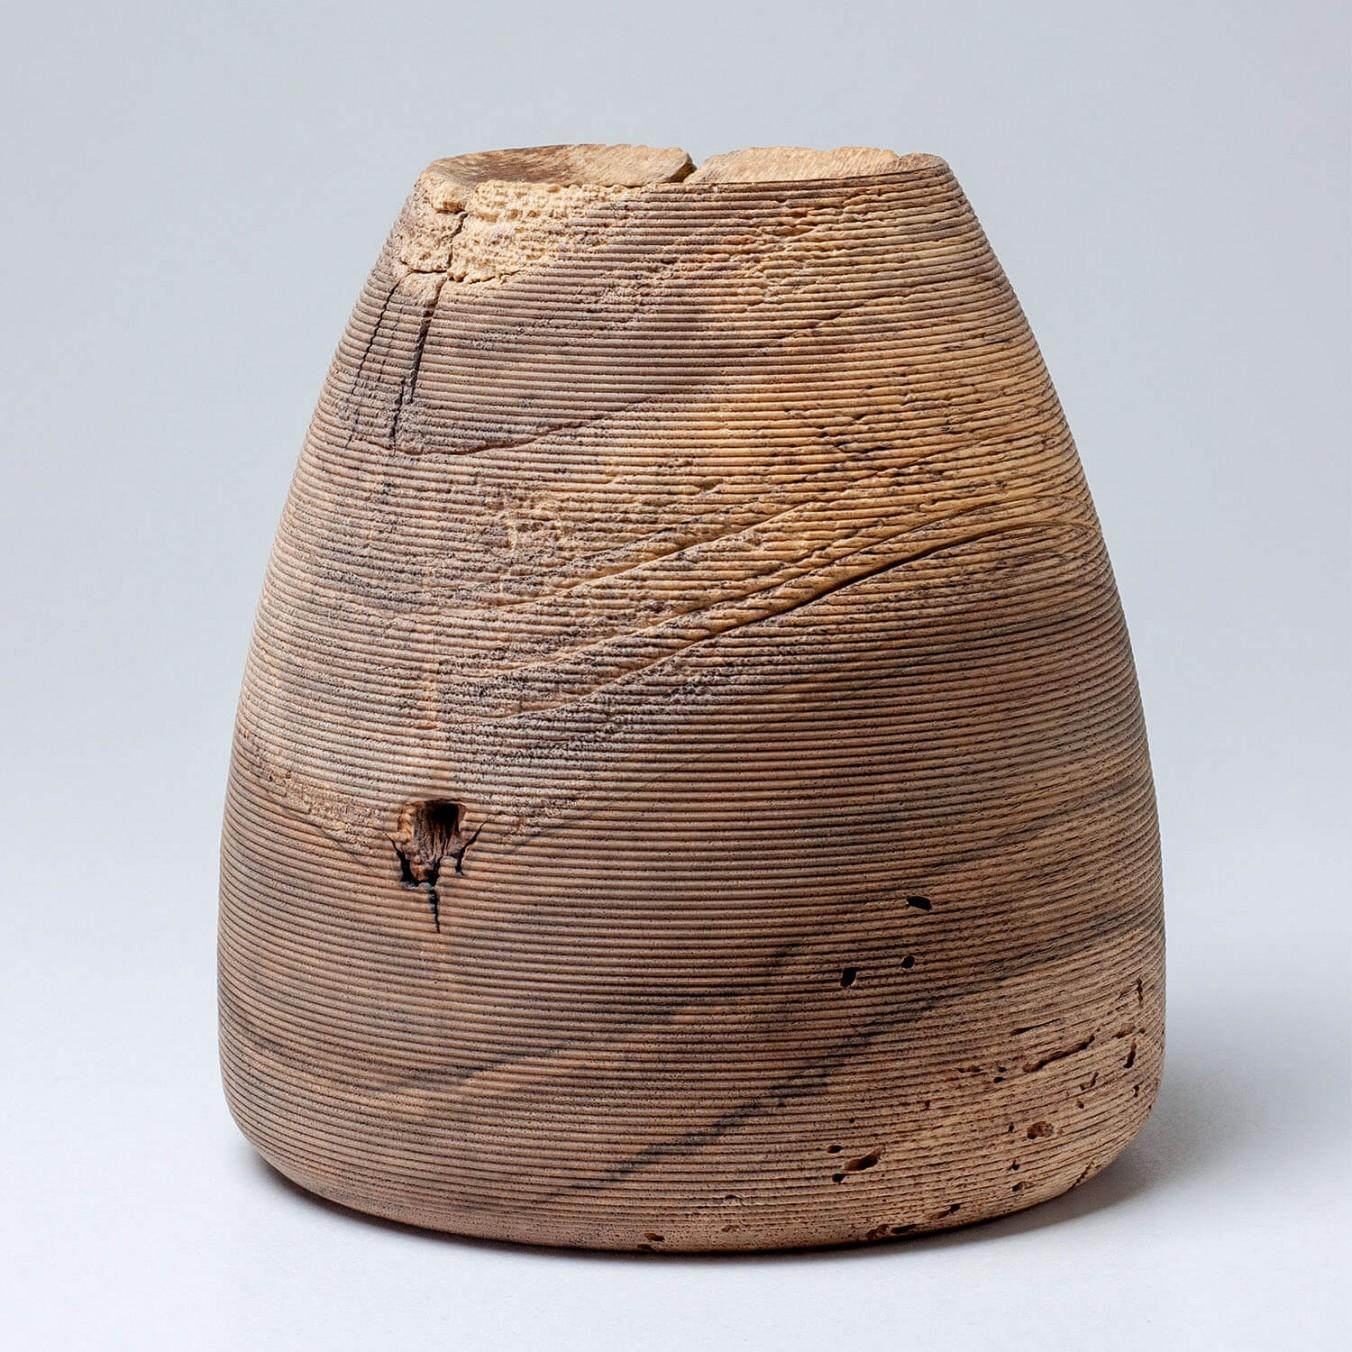 Small walnut vase